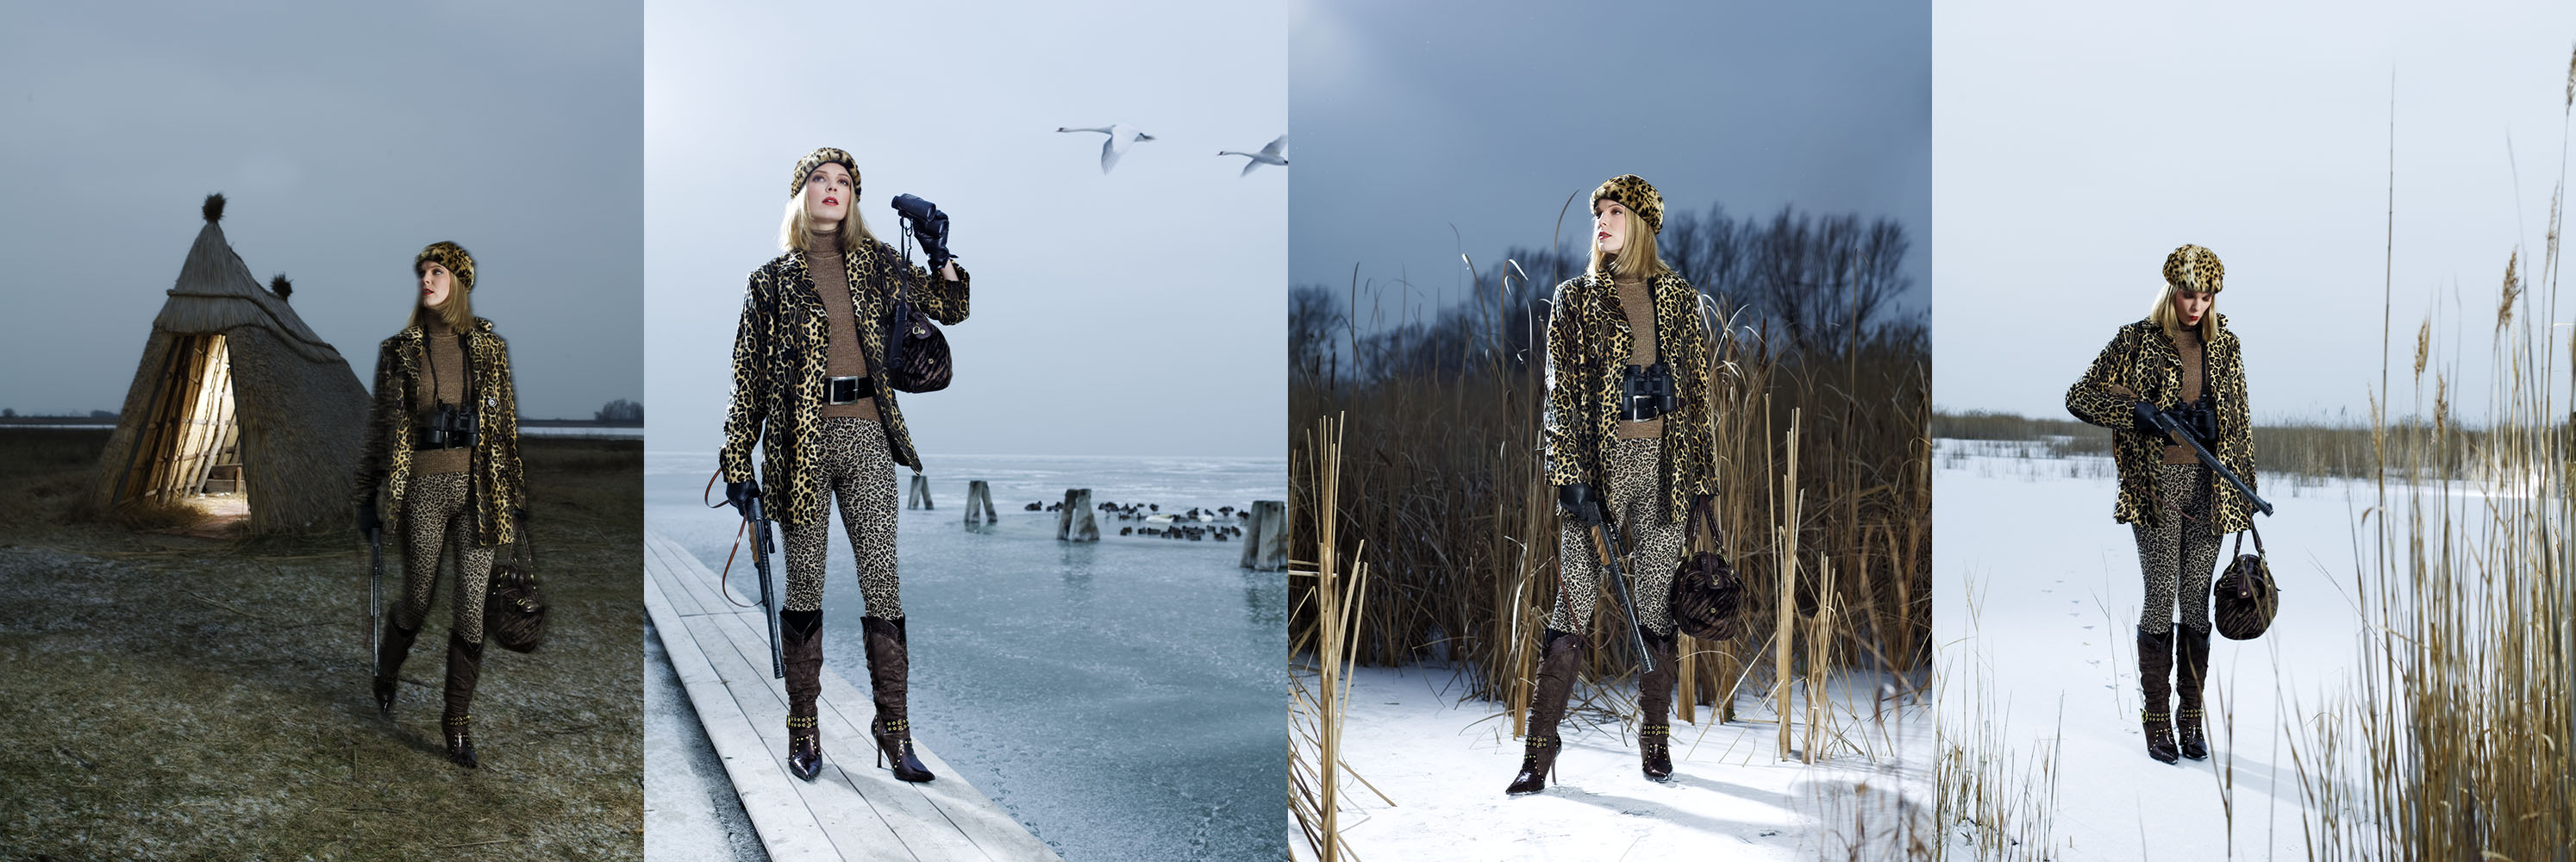 frontpage_winter_4seasons